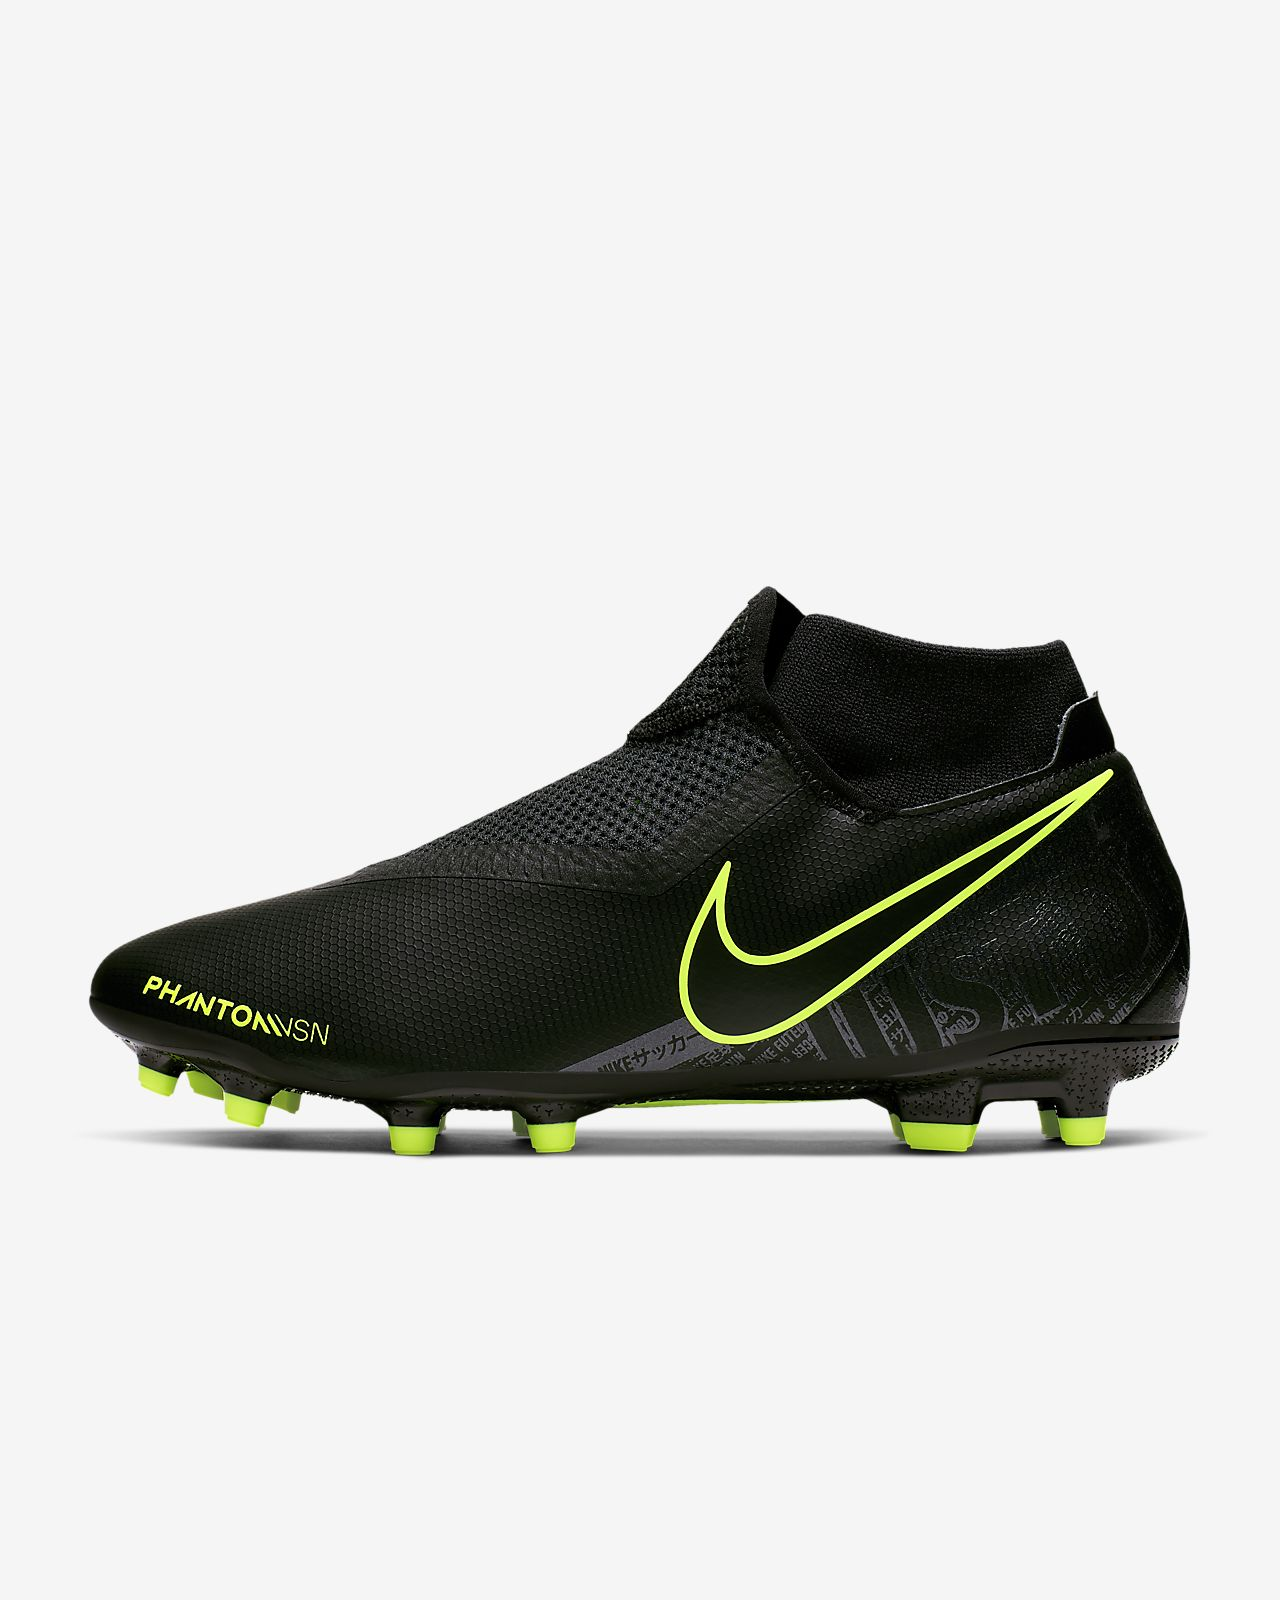 Nike Phantom Vision Academy Dynamic Fit MG Botas de fútbol para múltiples superficies